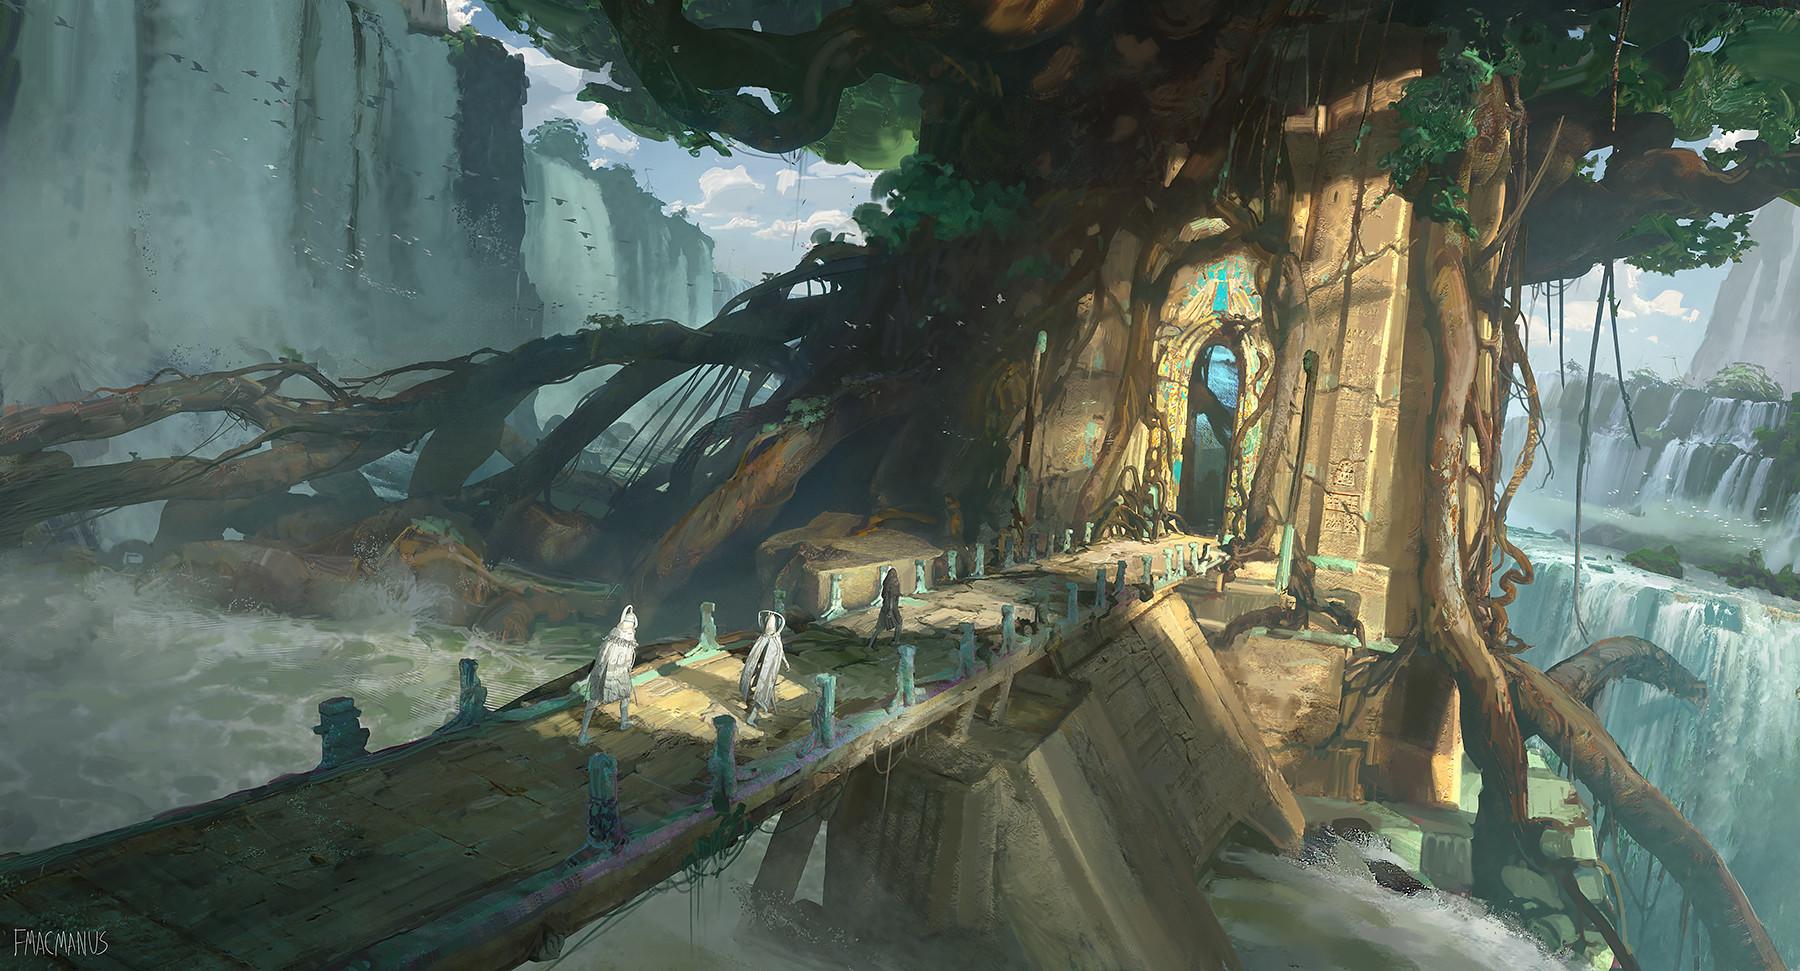 worldbuilding for Seven Lions design photoshop fantasy